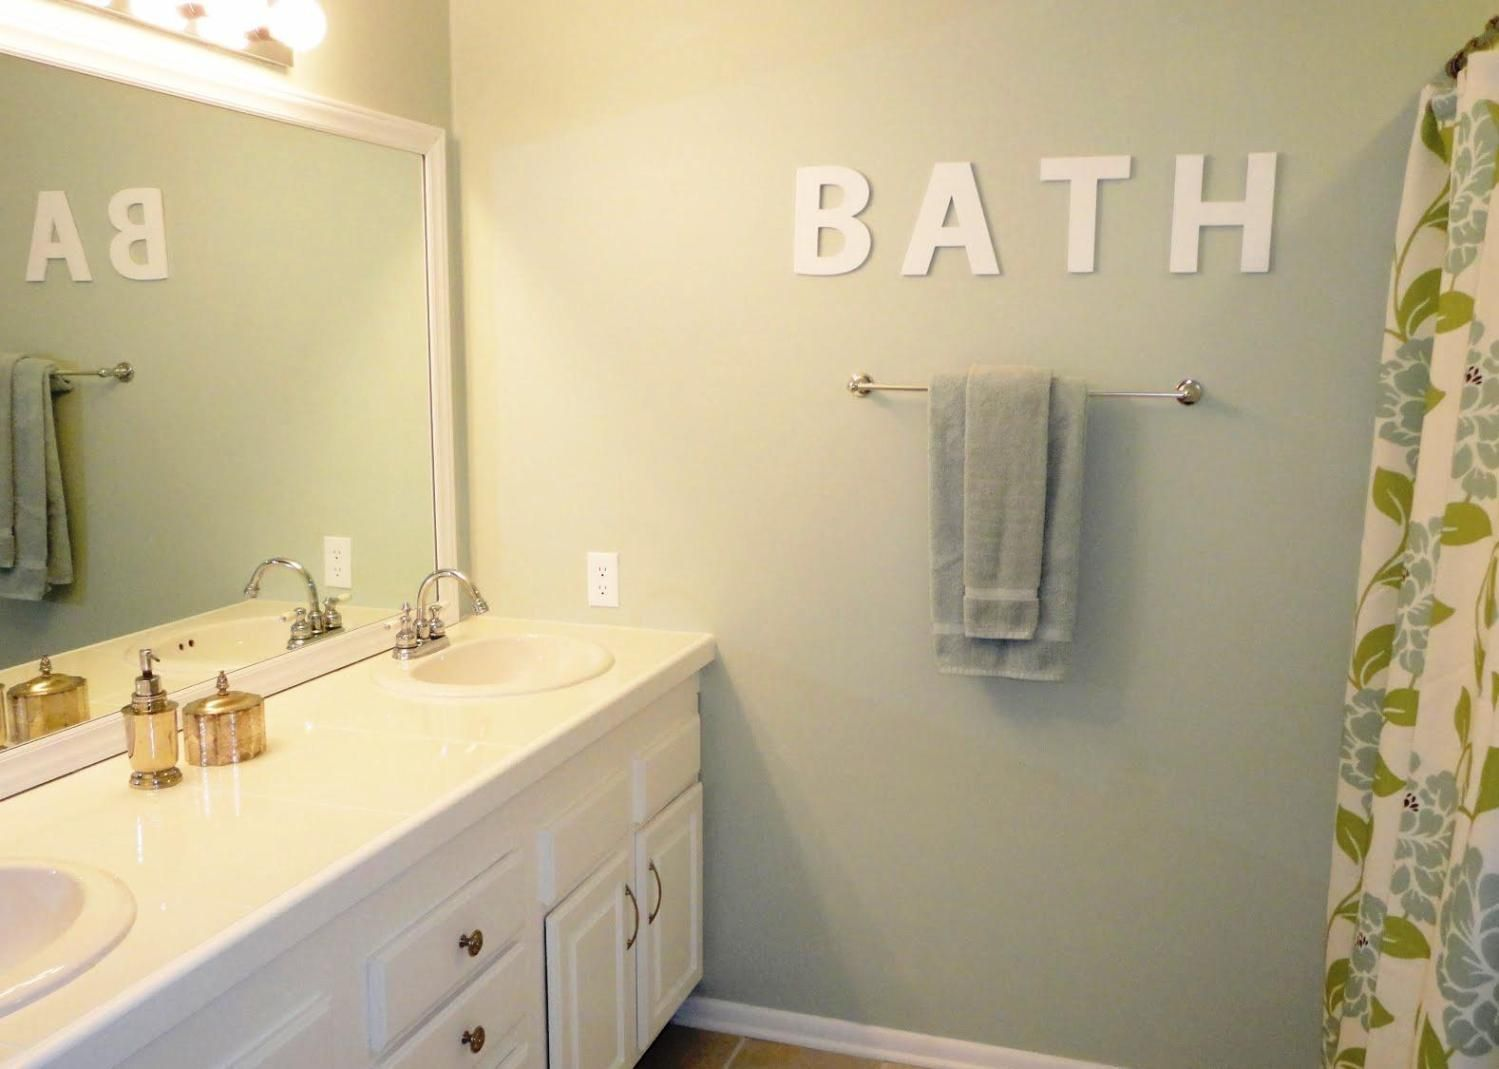 Latest Posts Under: Bathroom decorating ideas | bathroom design 2017 ...